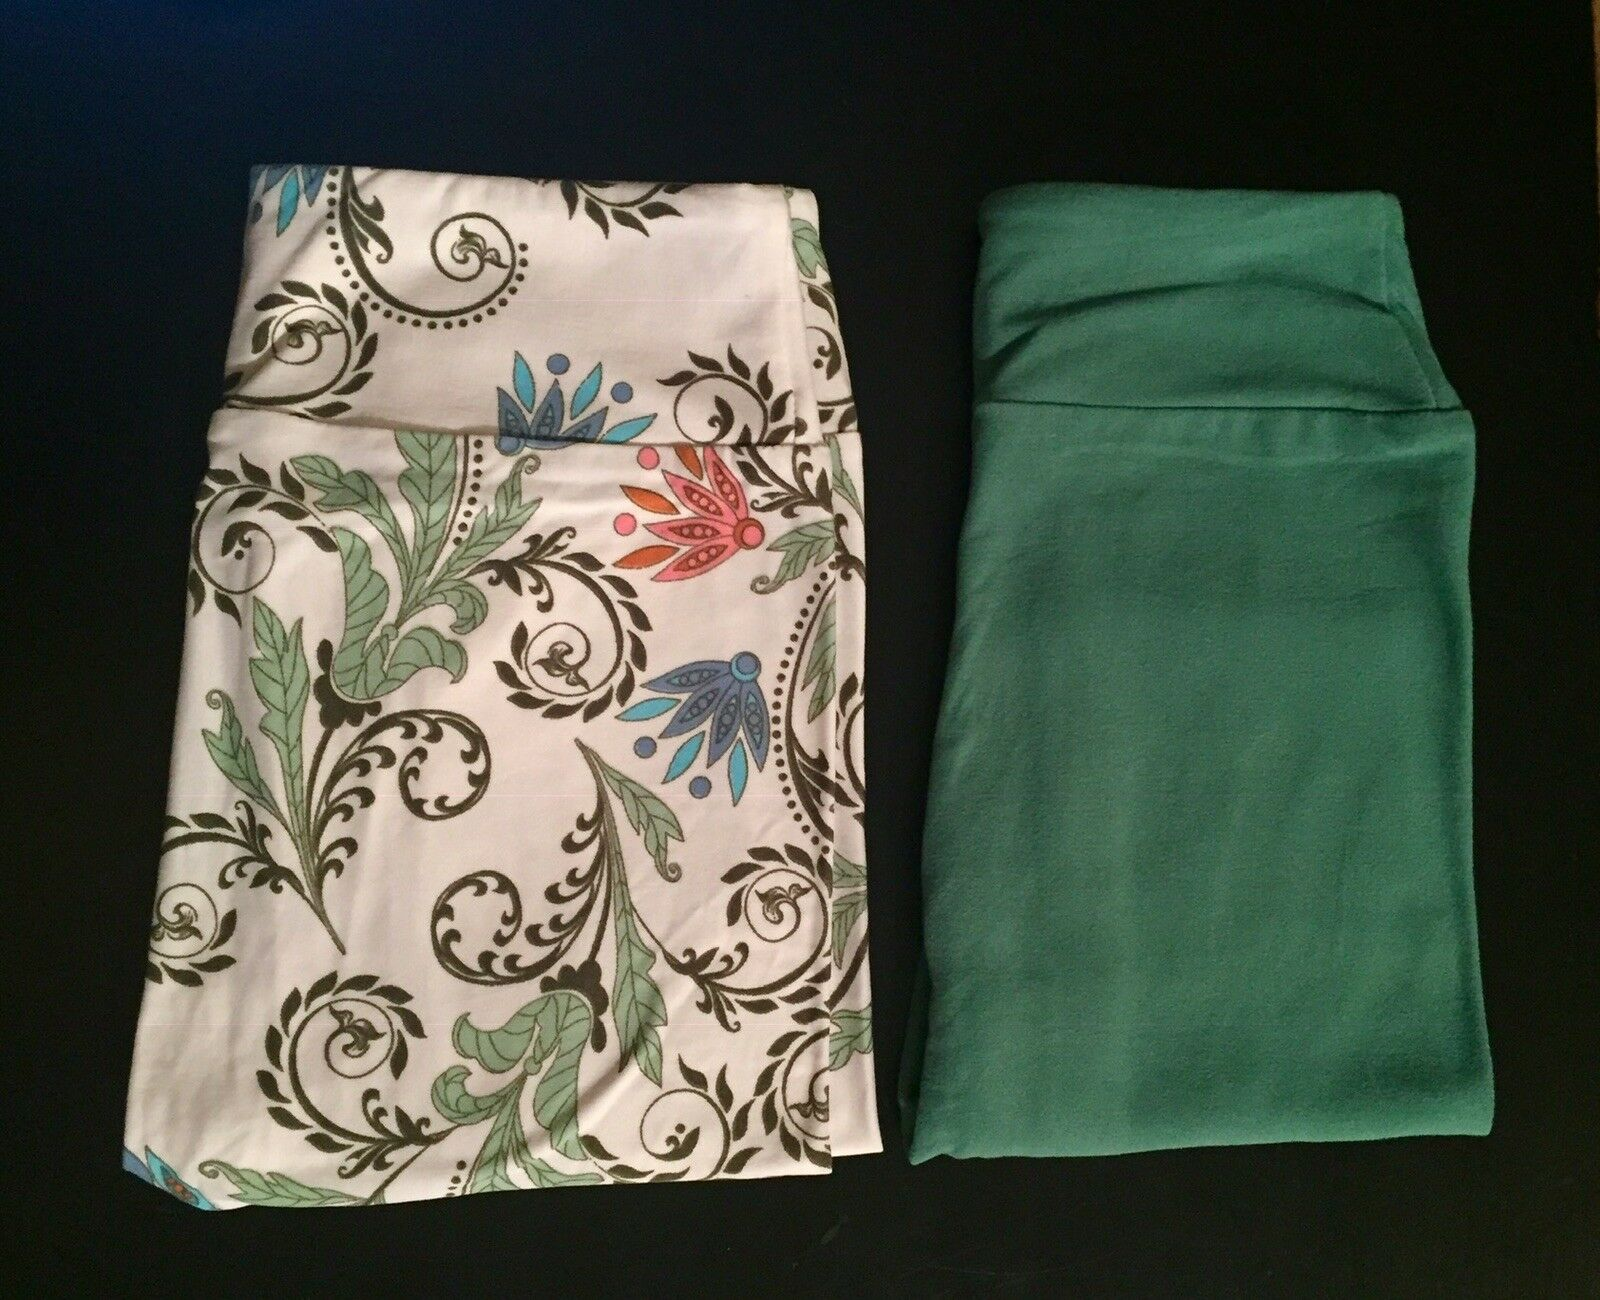 2 NEW Tween LEGGINGS LuLaRoe GREEN &CP Cream FLORAL SCROLLS UNICORN Fits Adult 4